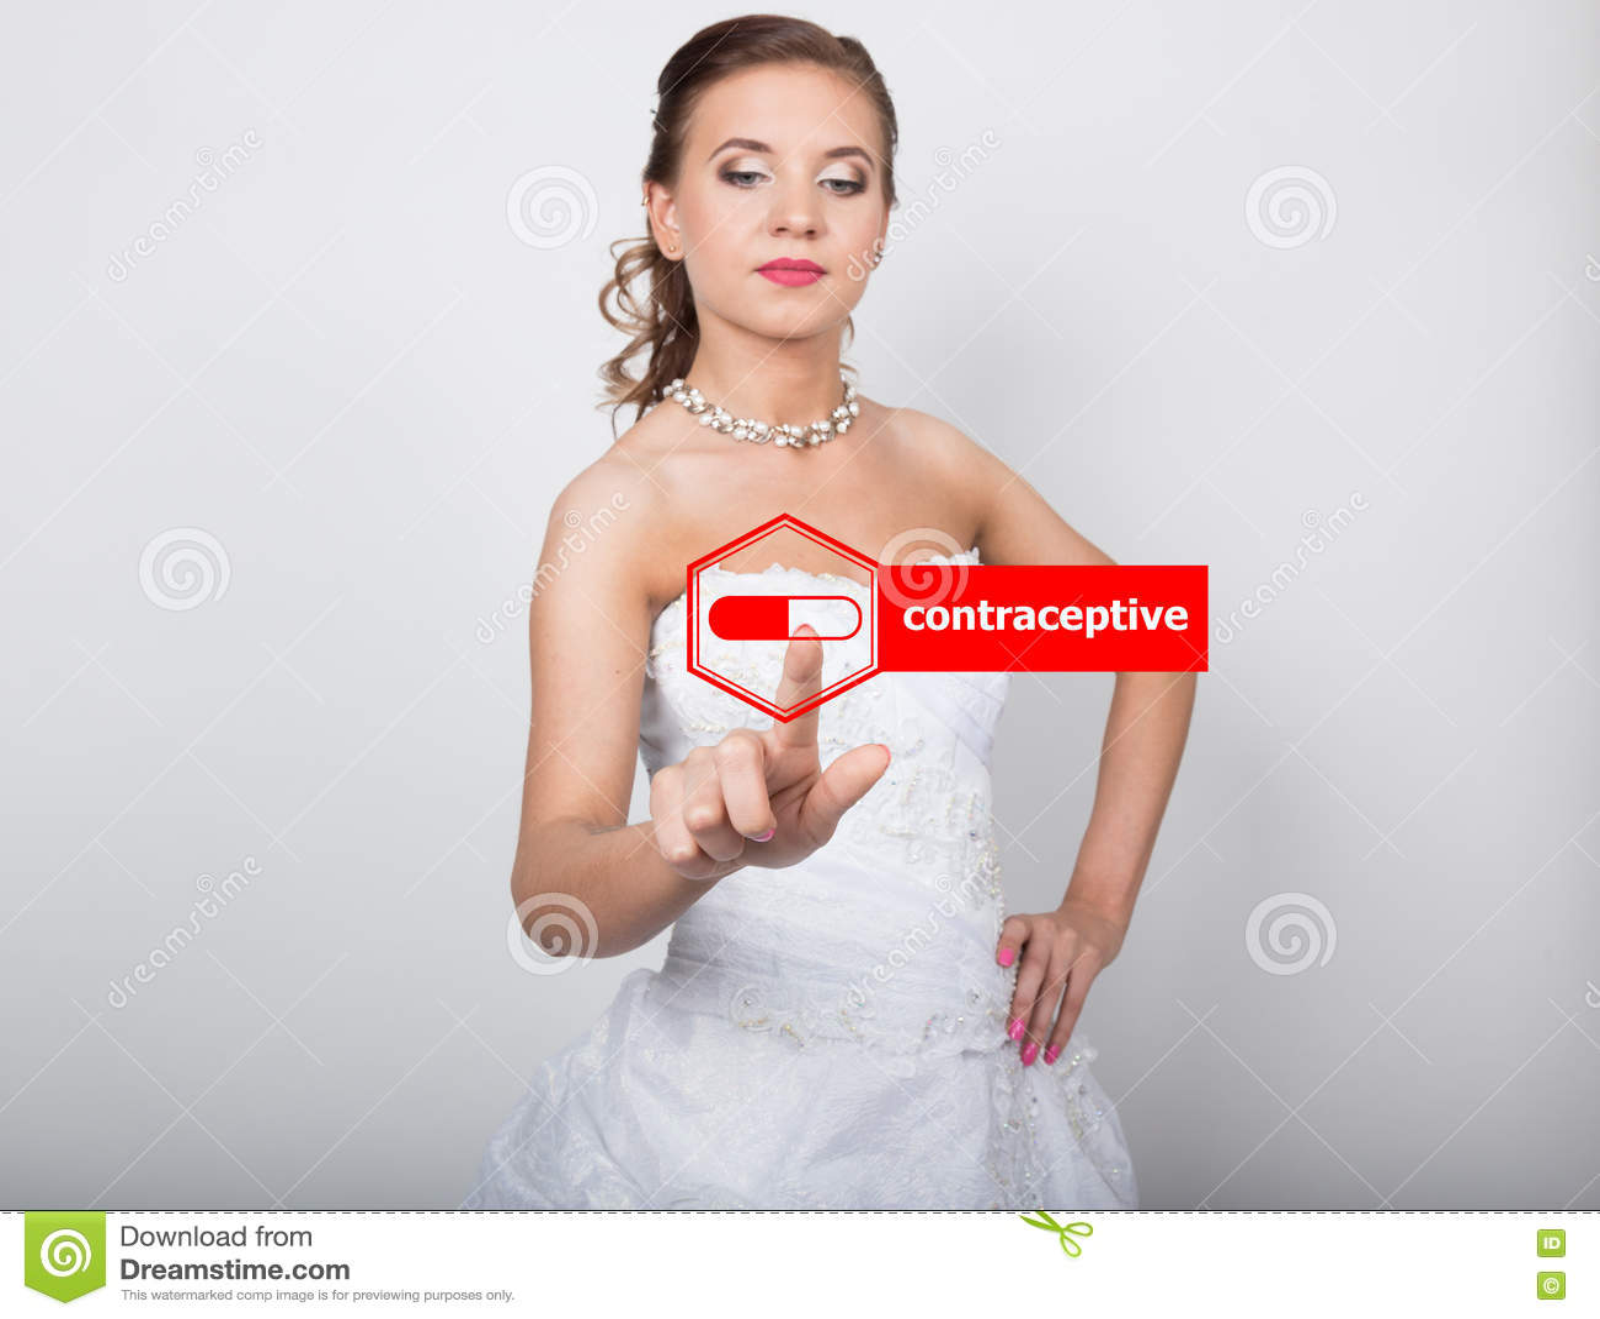 Virtual Fashion Set Interview Stock Photography